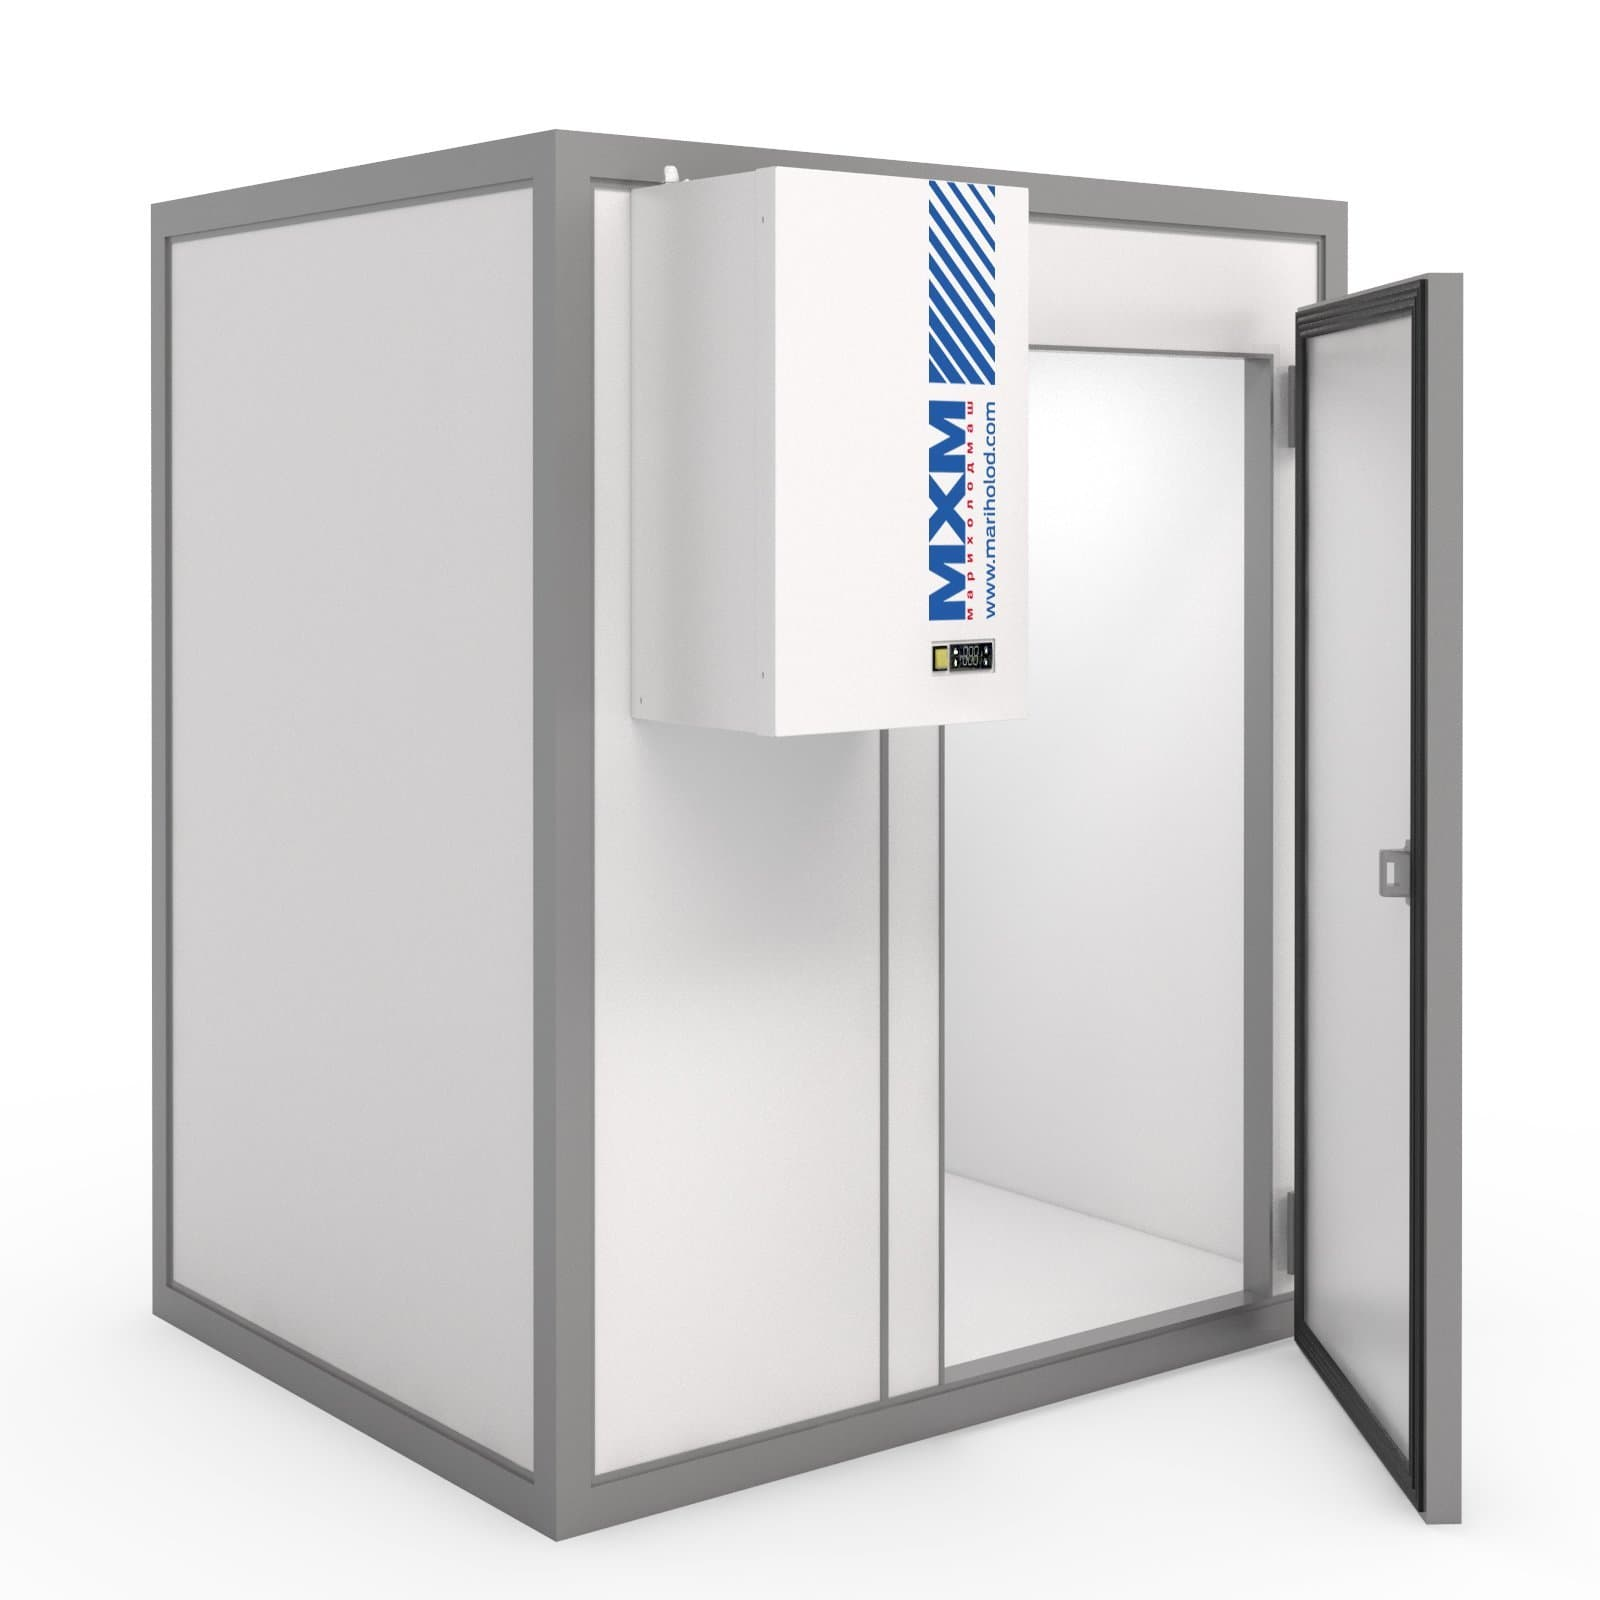 Камера холодильная КХН-116,12 (2560×19060×2720 мм)